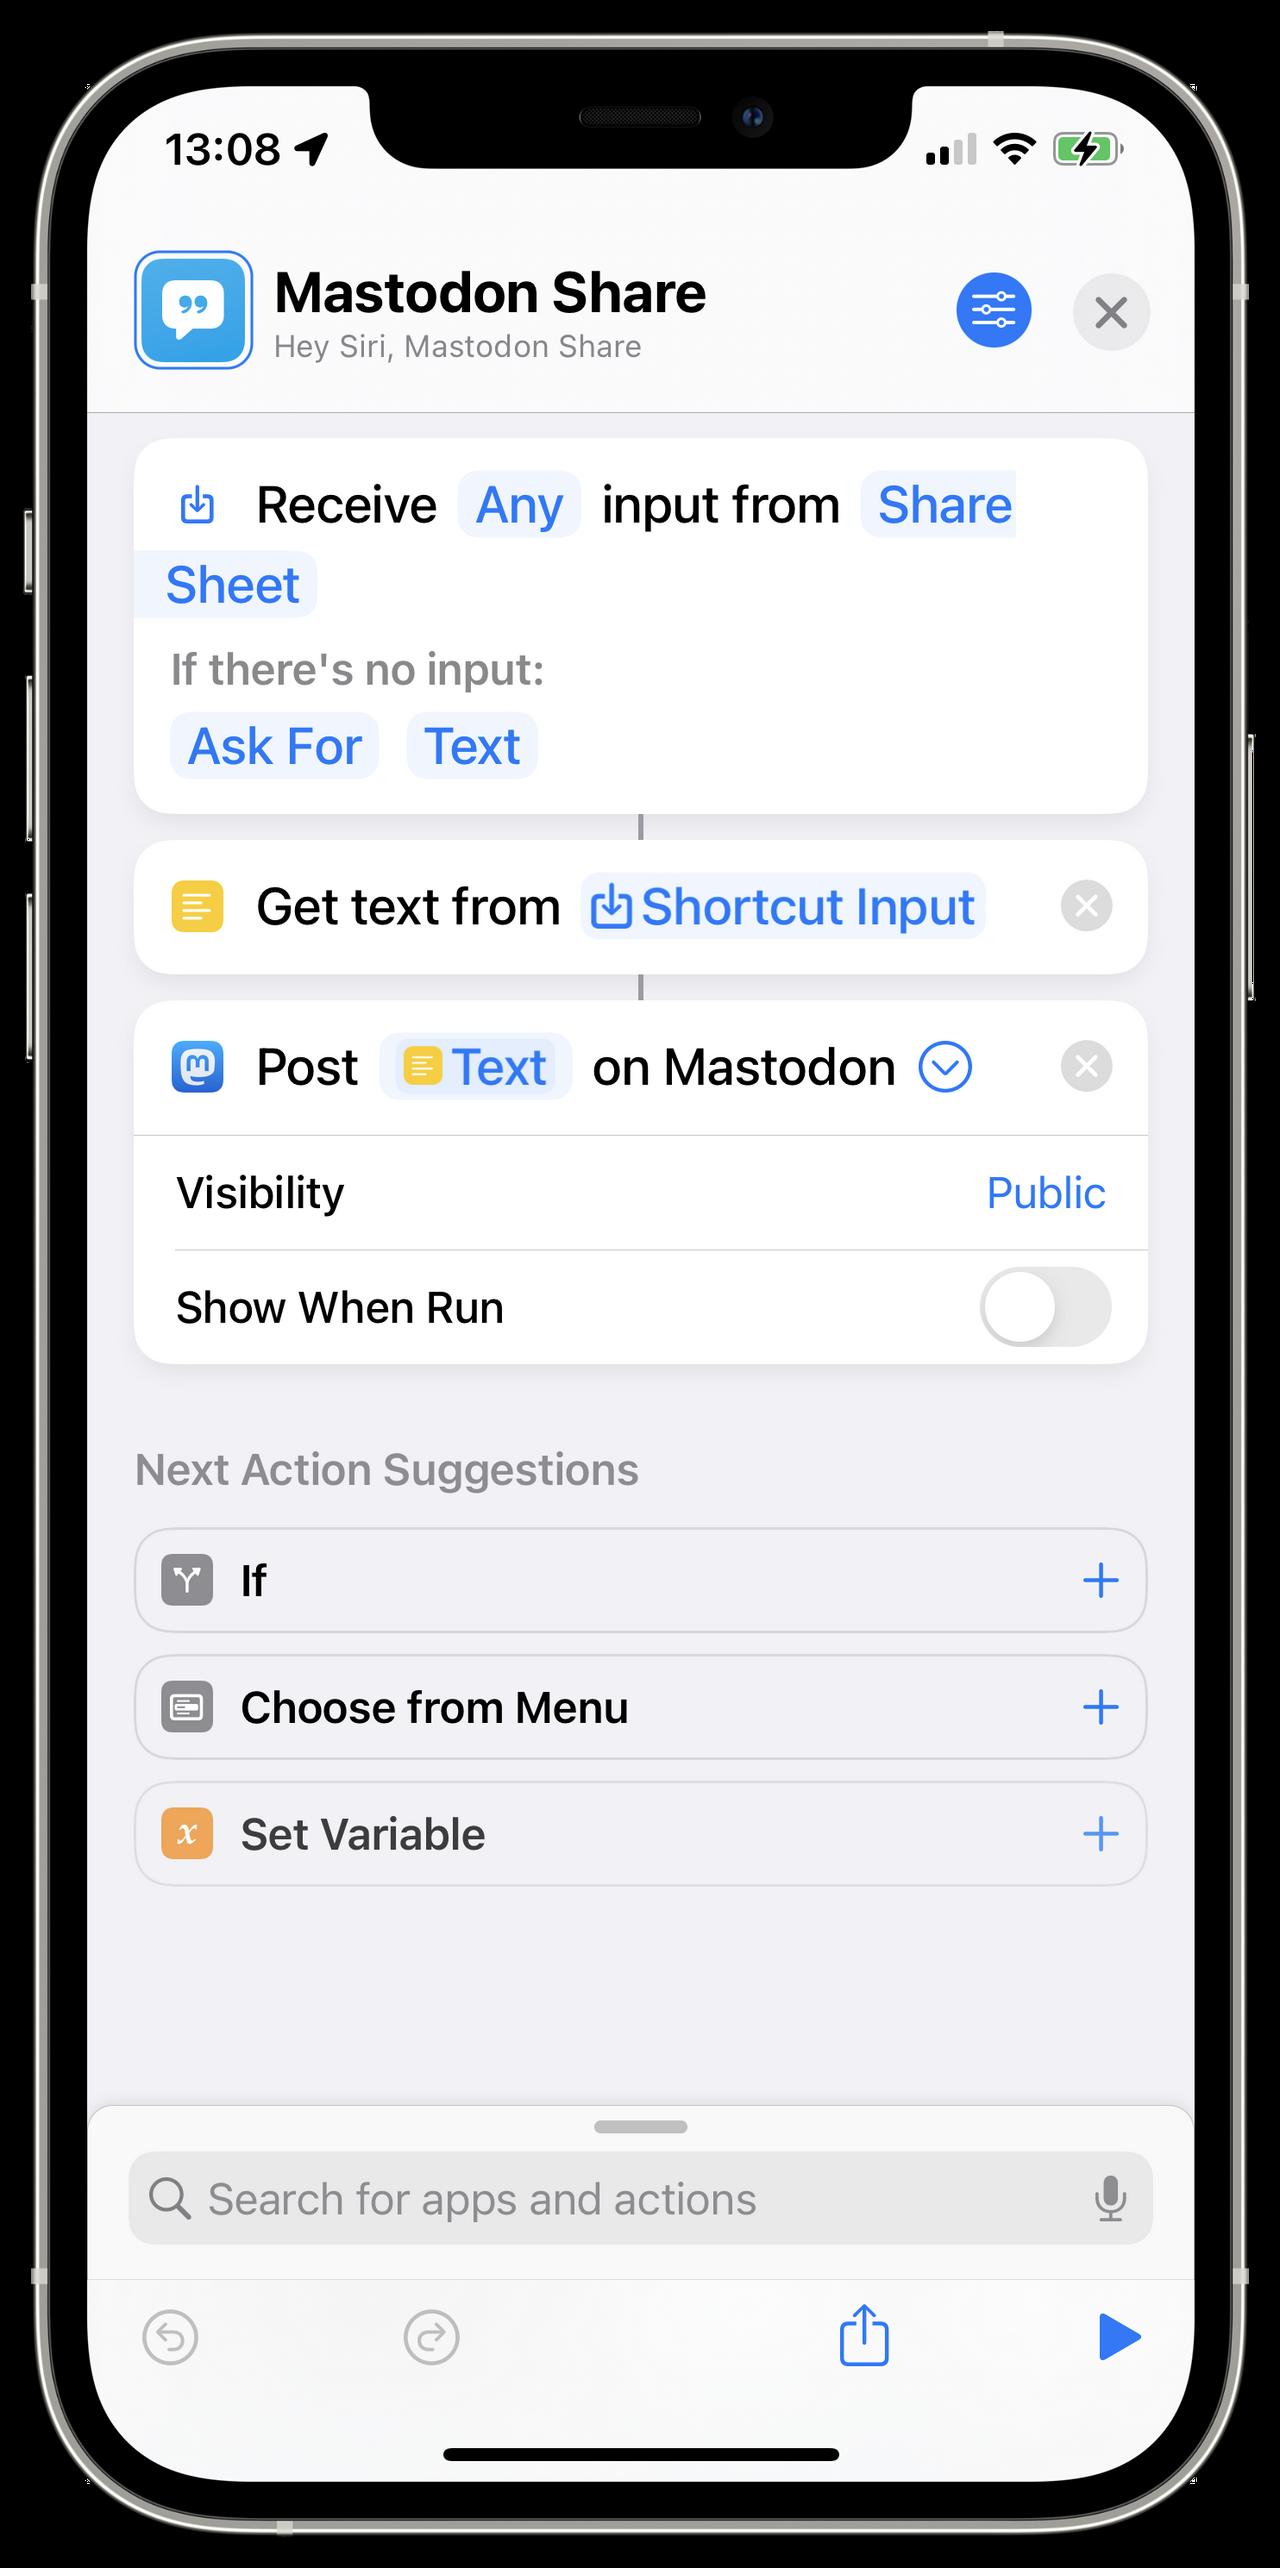 Mastodon Share Siri Shortcut